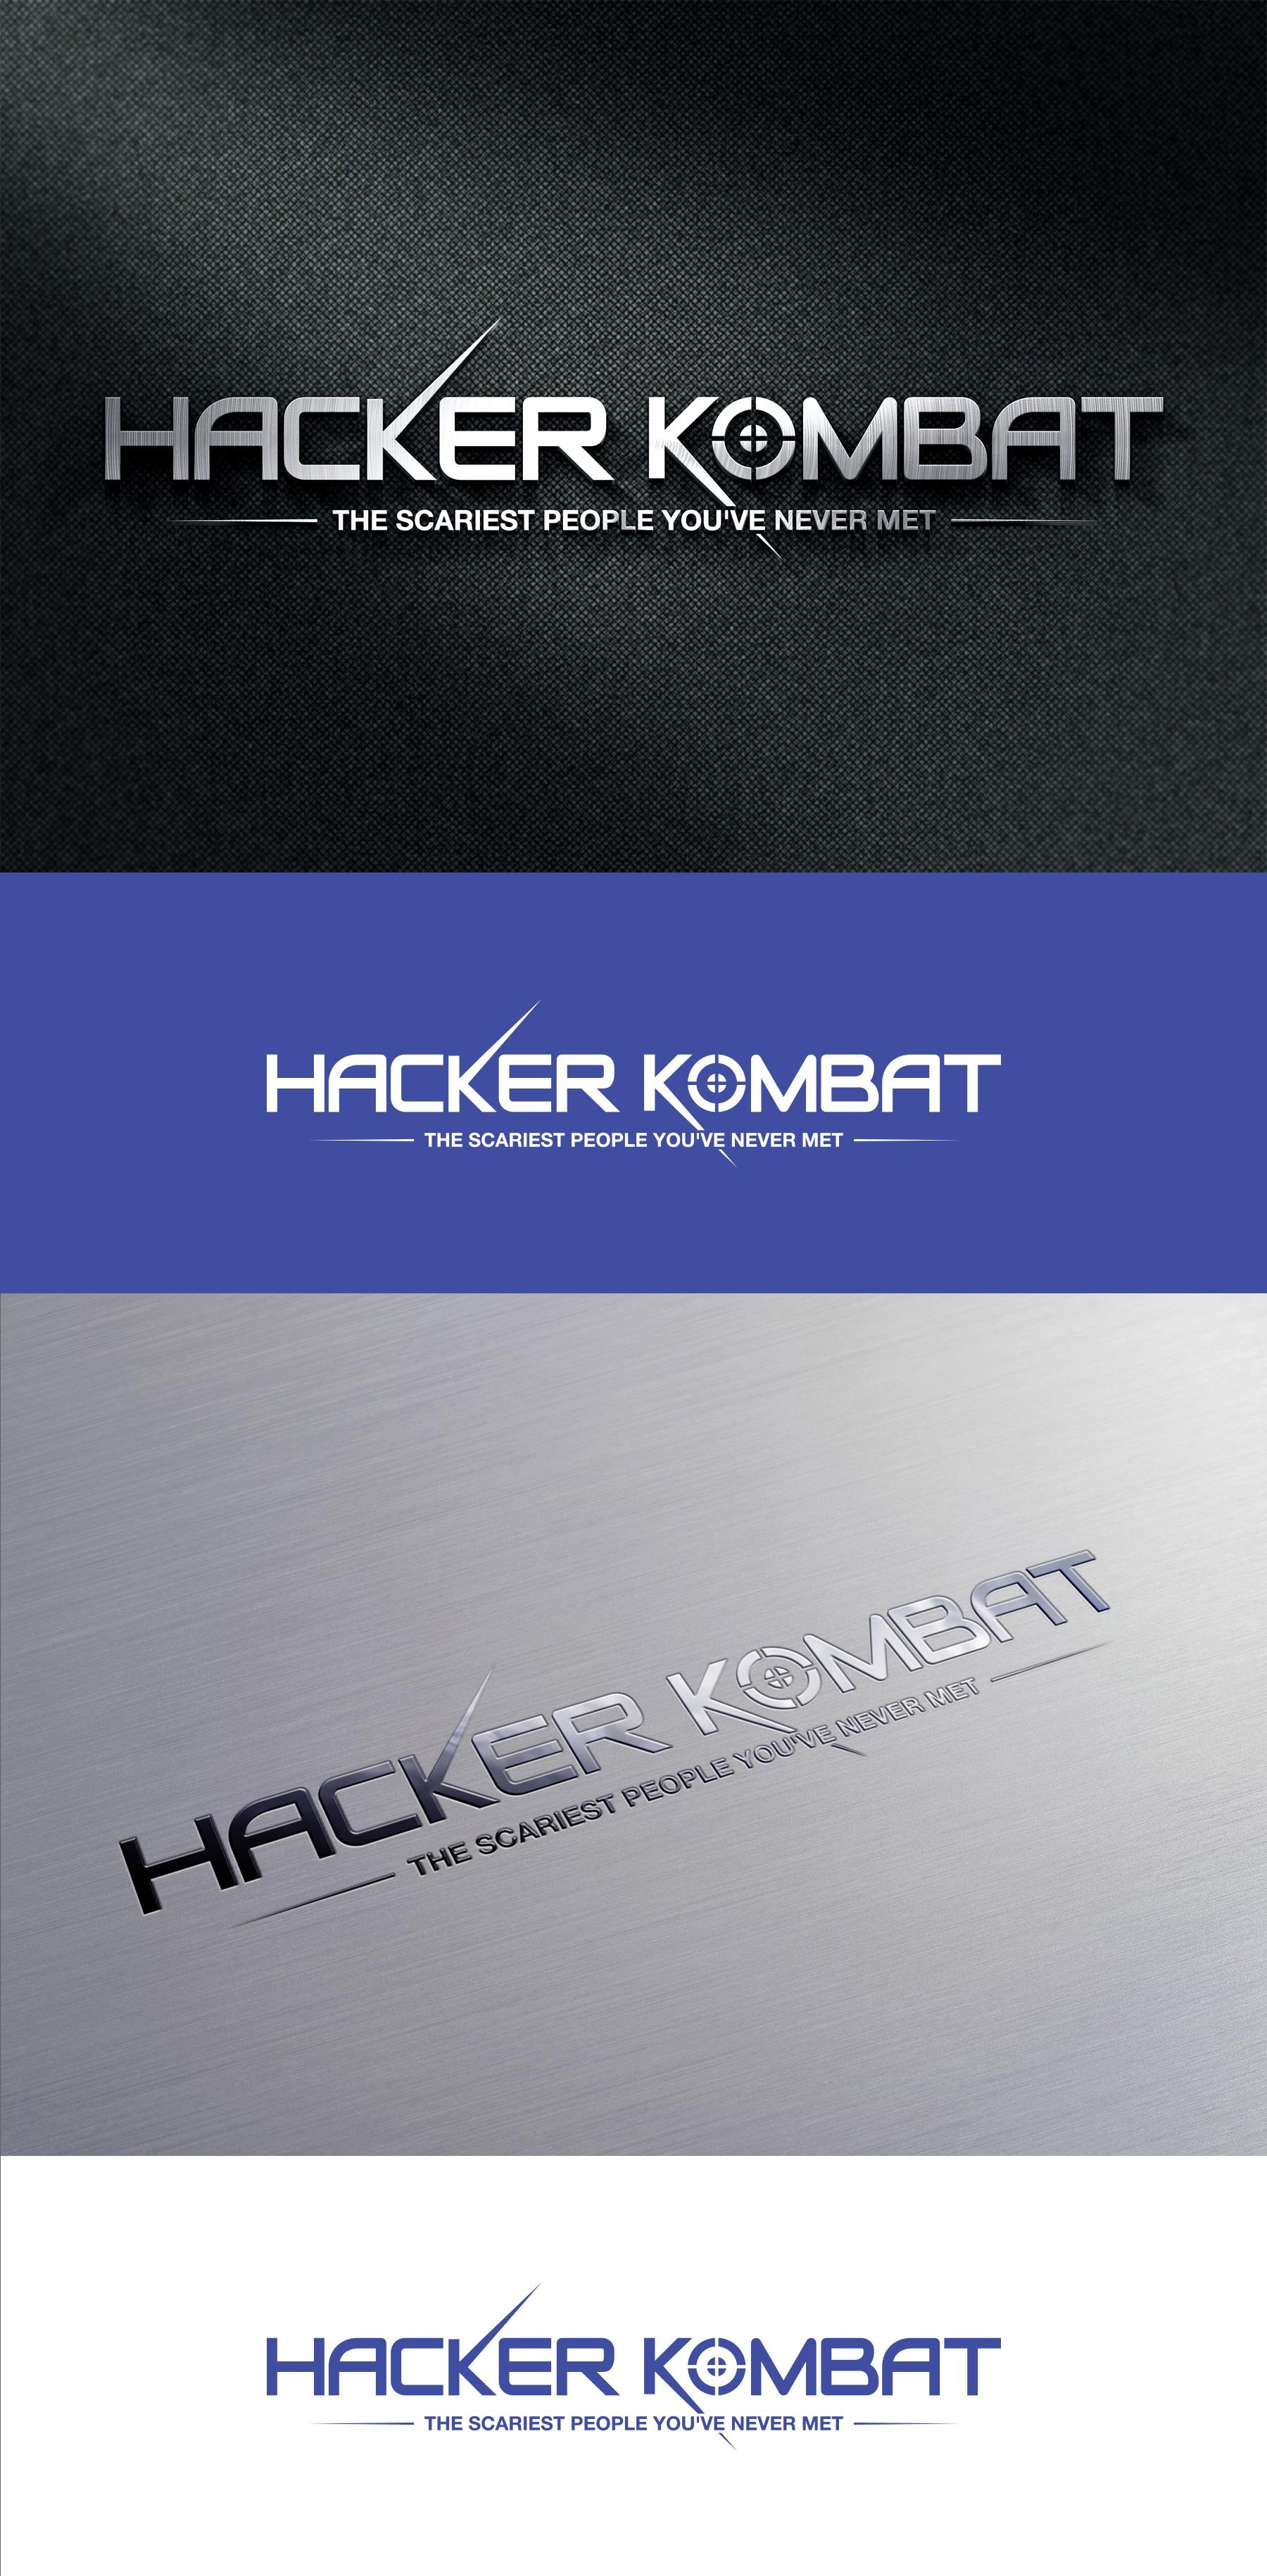 Shape the future and win the Hacker Kombat logo contest!